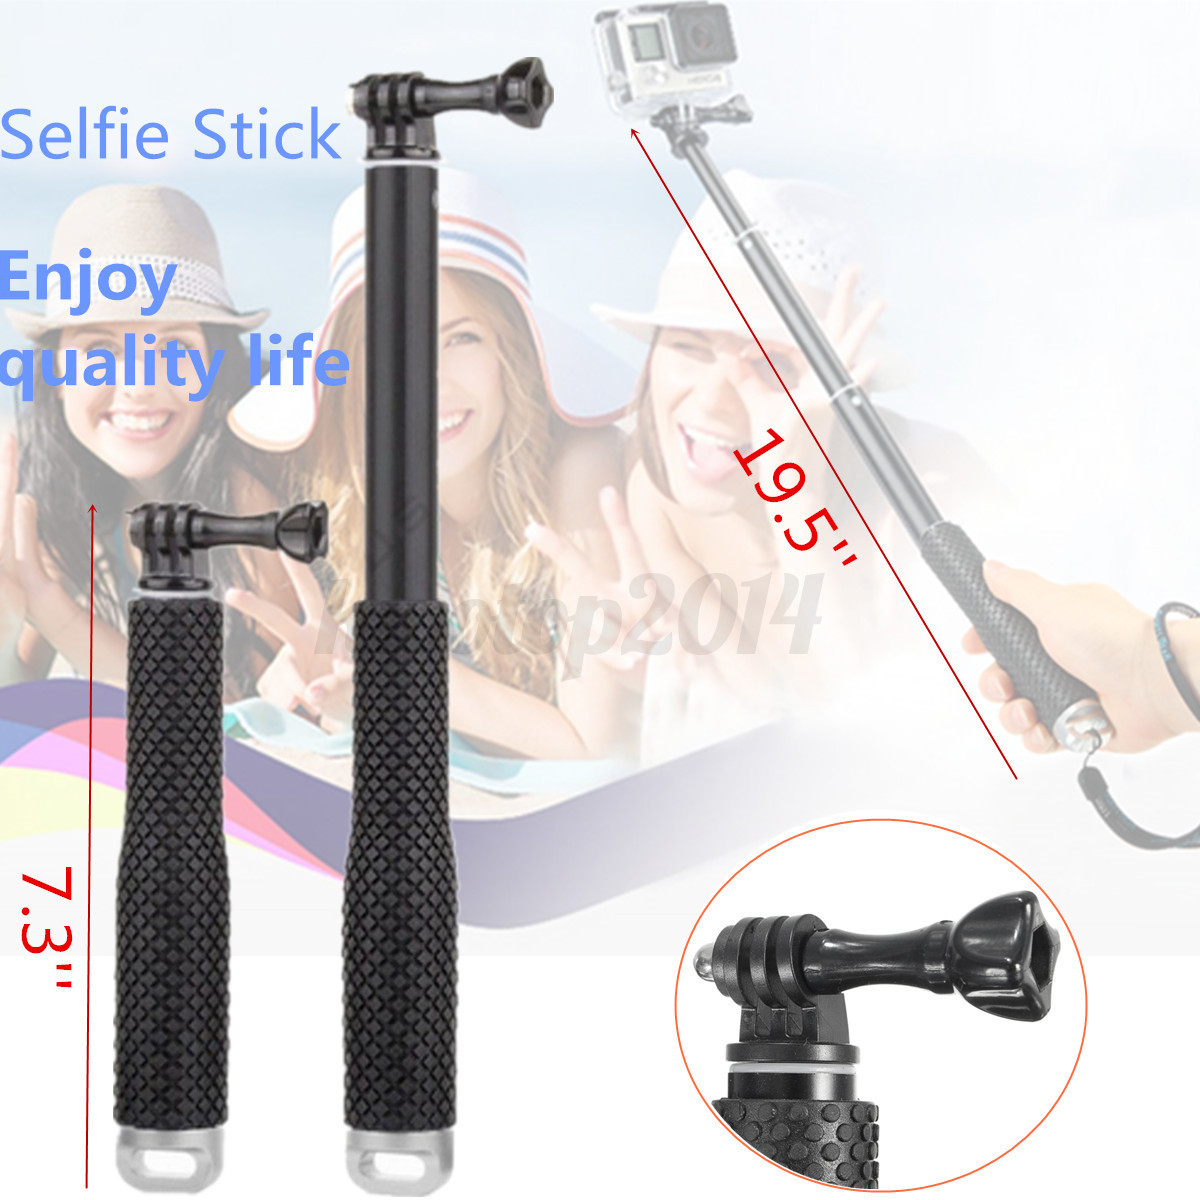 19 5 39 39 aluminum telescopic hand held waterproof selfie stick for spor. Black Bedroom Furniture Sets. Home Design Ideas